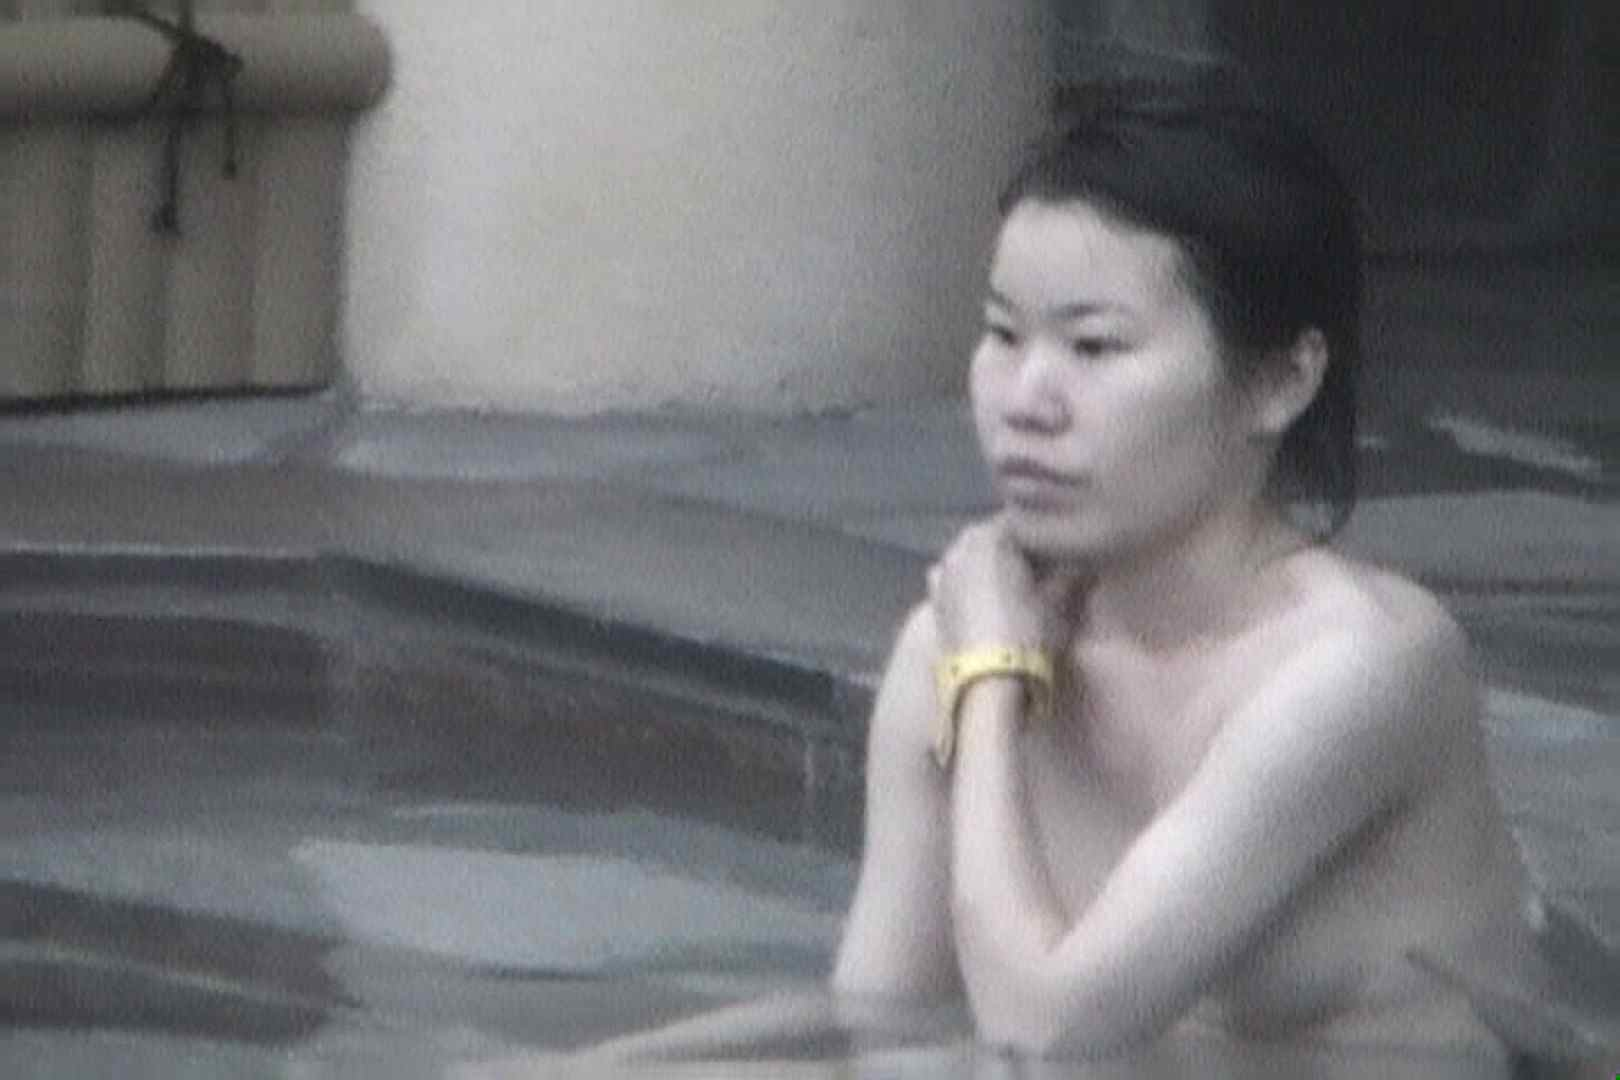 Aquaな露天風呂Vol.556 露天風呂編  99PIX 58